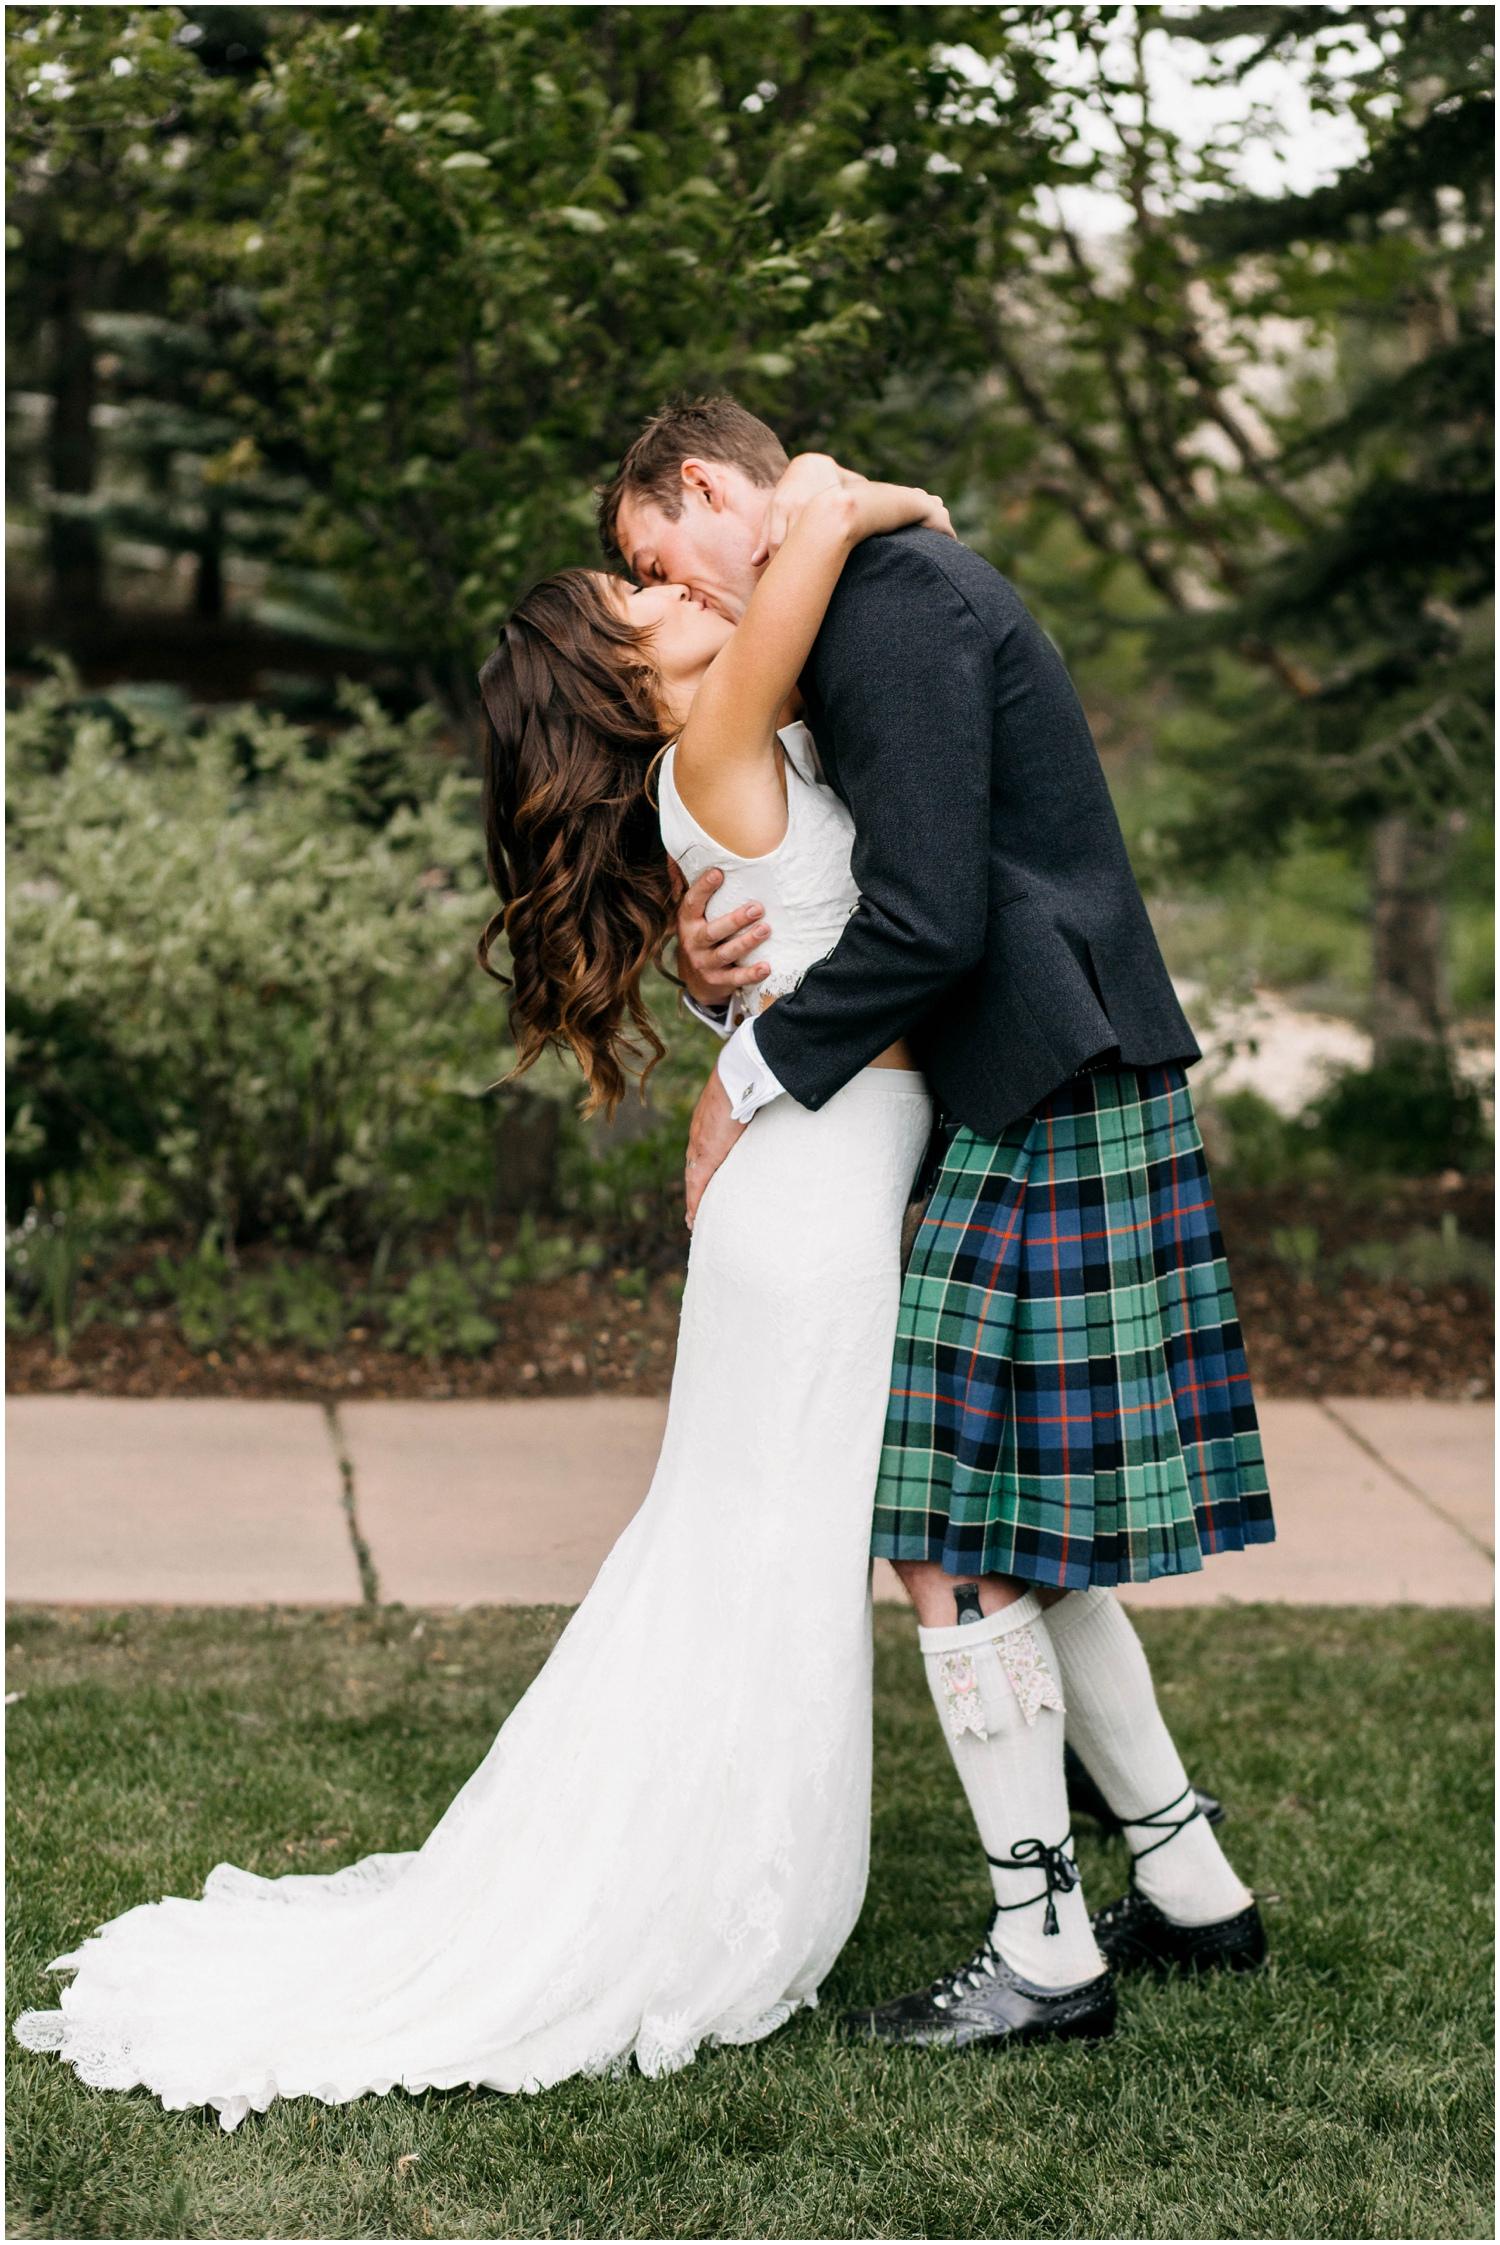 Courtney+Jamie_modern_vail_village_wedding_colorado_taylor_powers_0082.jpg